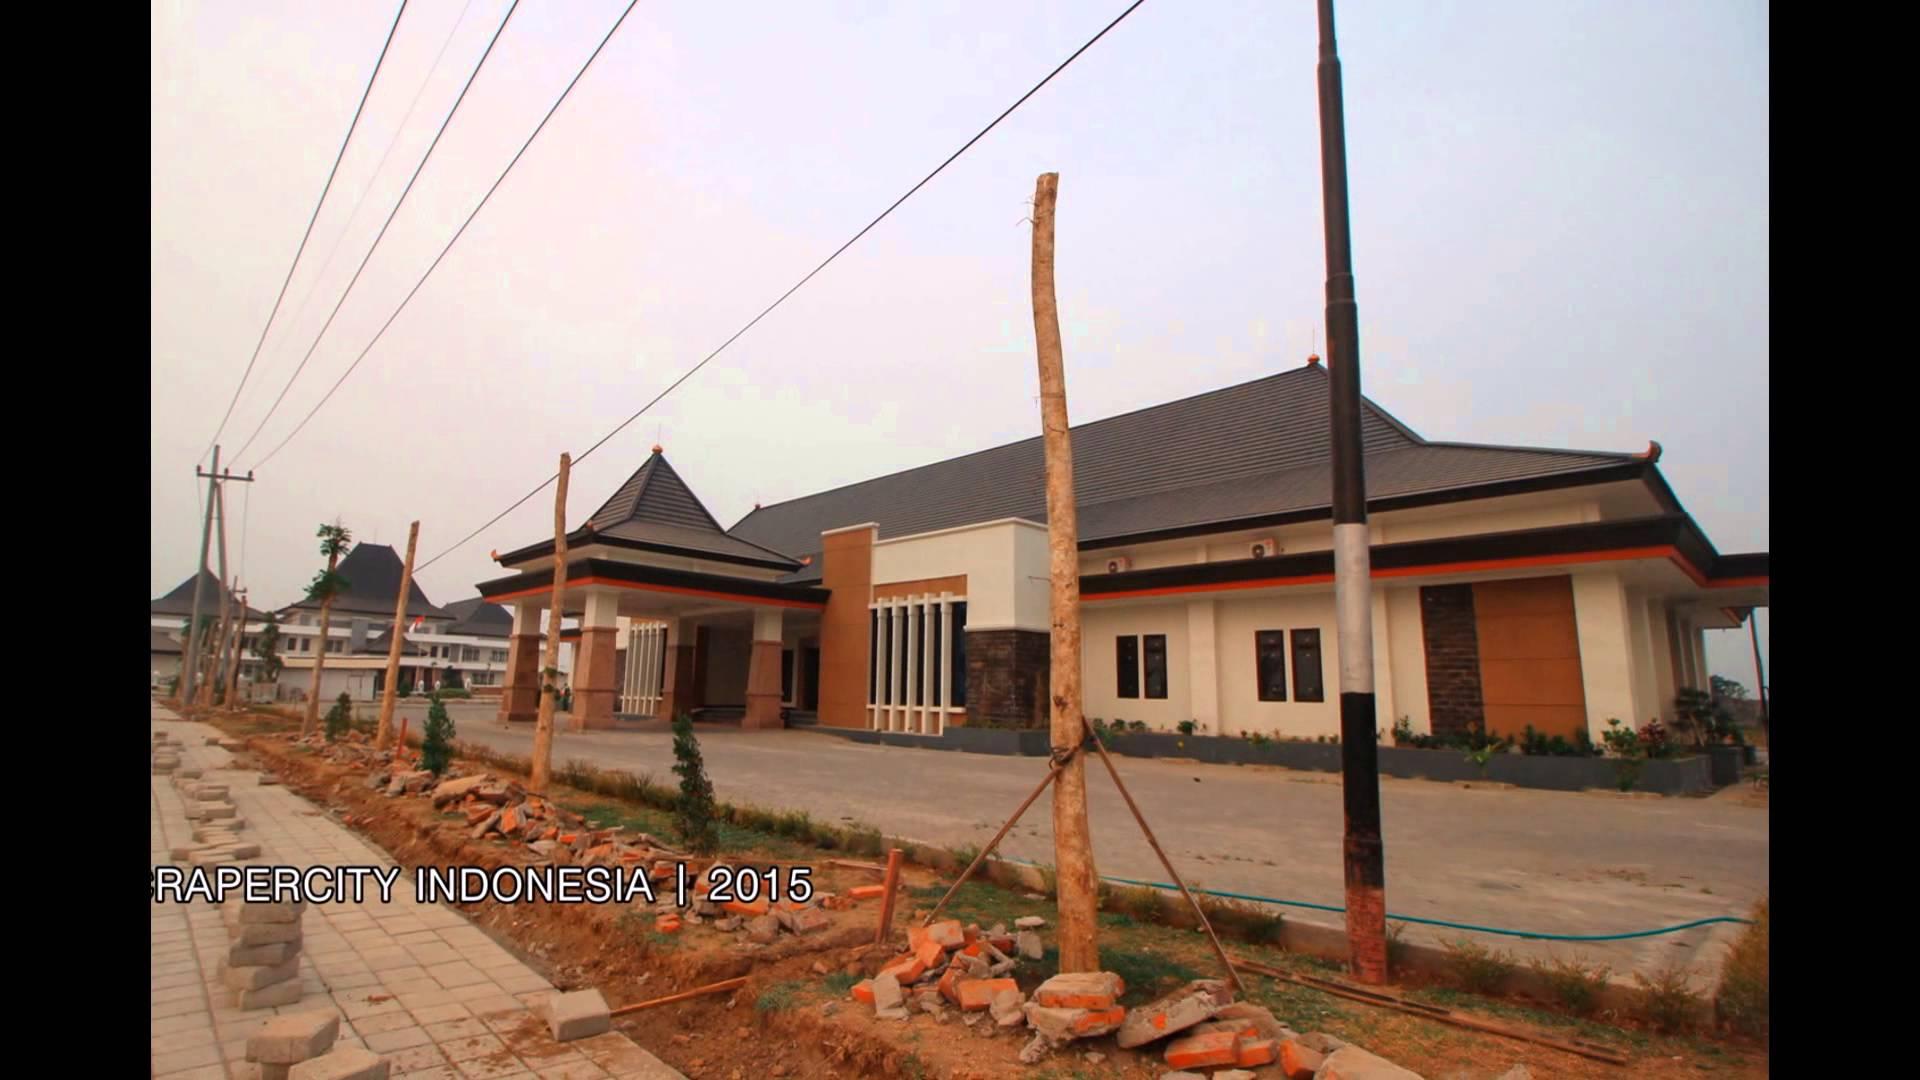 Pusat Pemerintahan Kabupaten Madiun Alun Kota Caruban 23 Oktober 2015